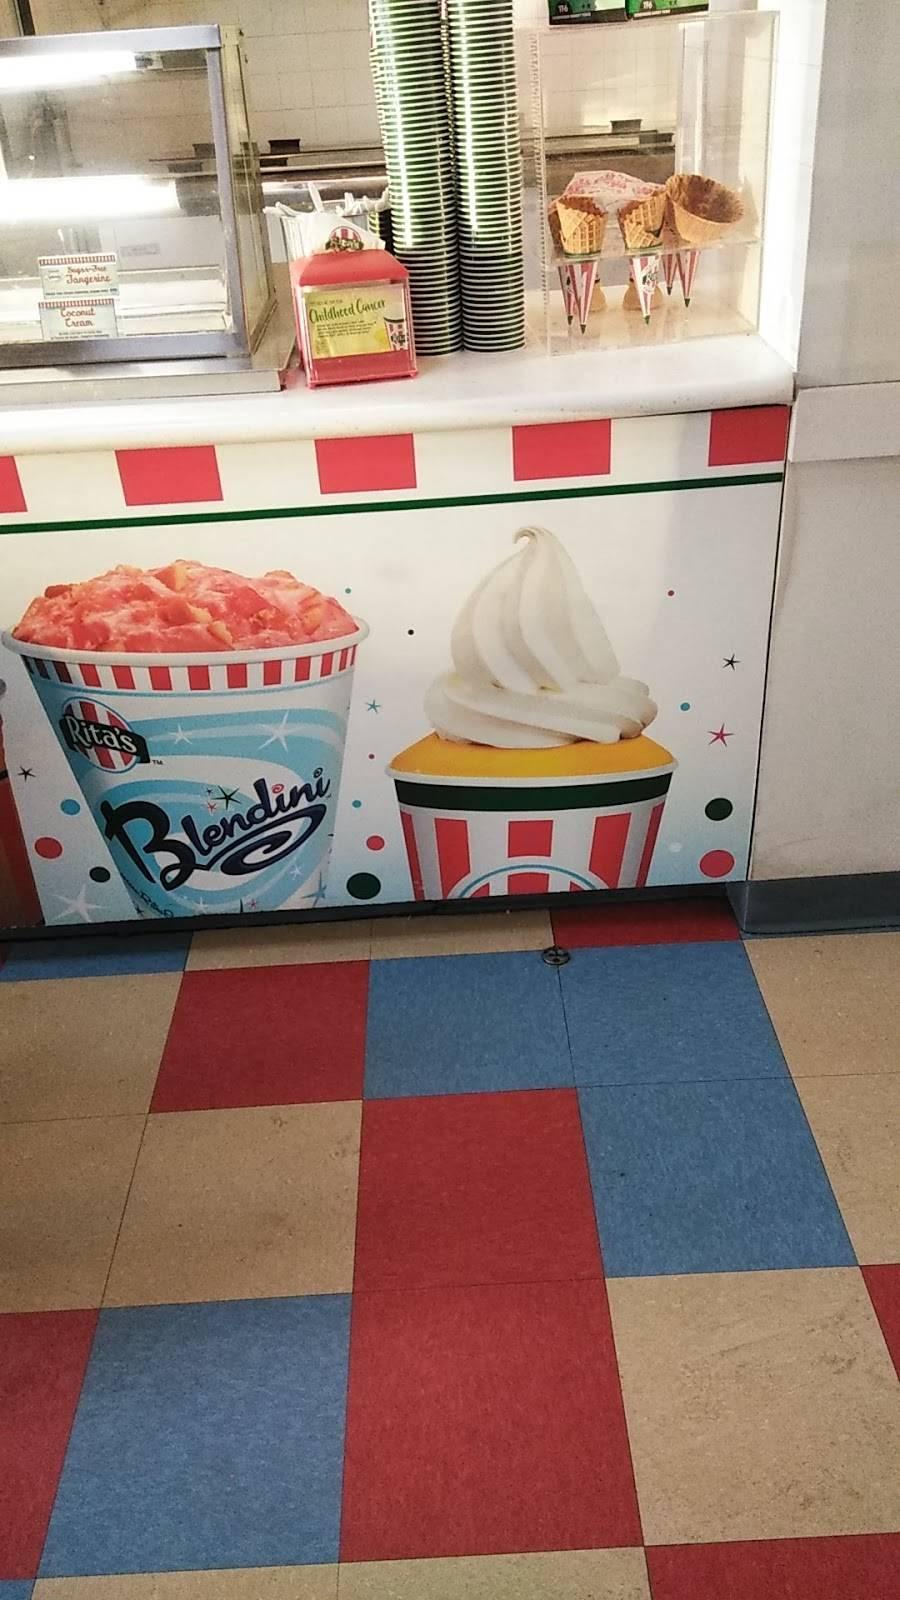 Ritas Italian Ice & Frozen Custard | restaurant | 184 Essex St, Lodi, NJ 07644, USA | 2018430882 OR +1 201-843-0882